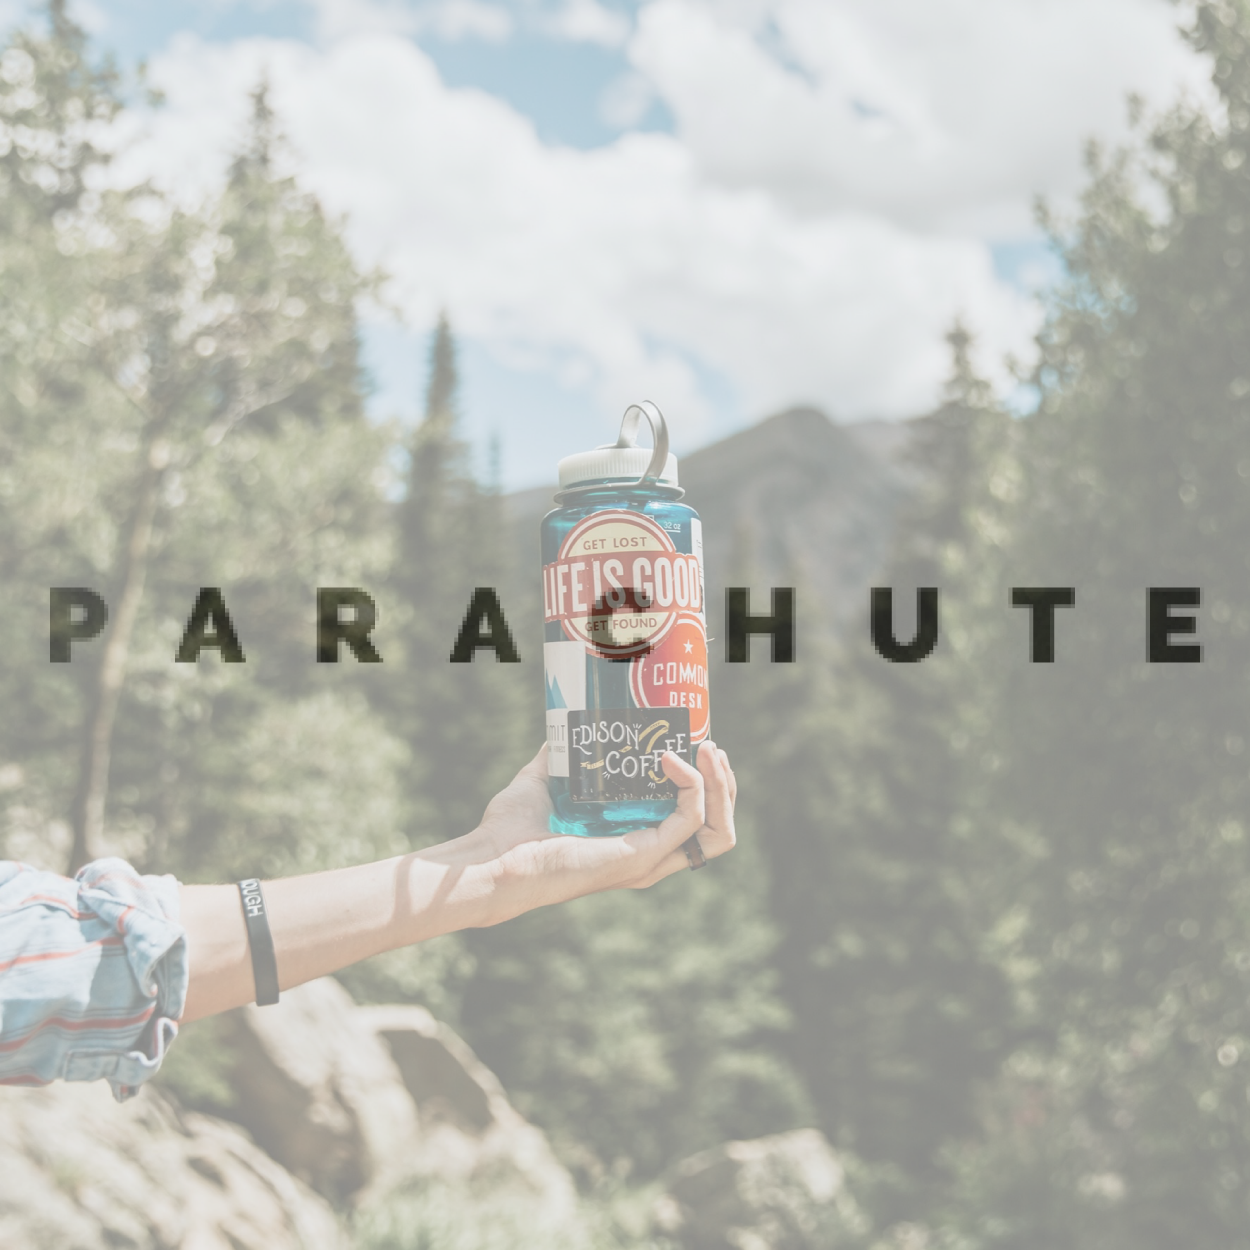 Kaz-Weida-Parachute.png